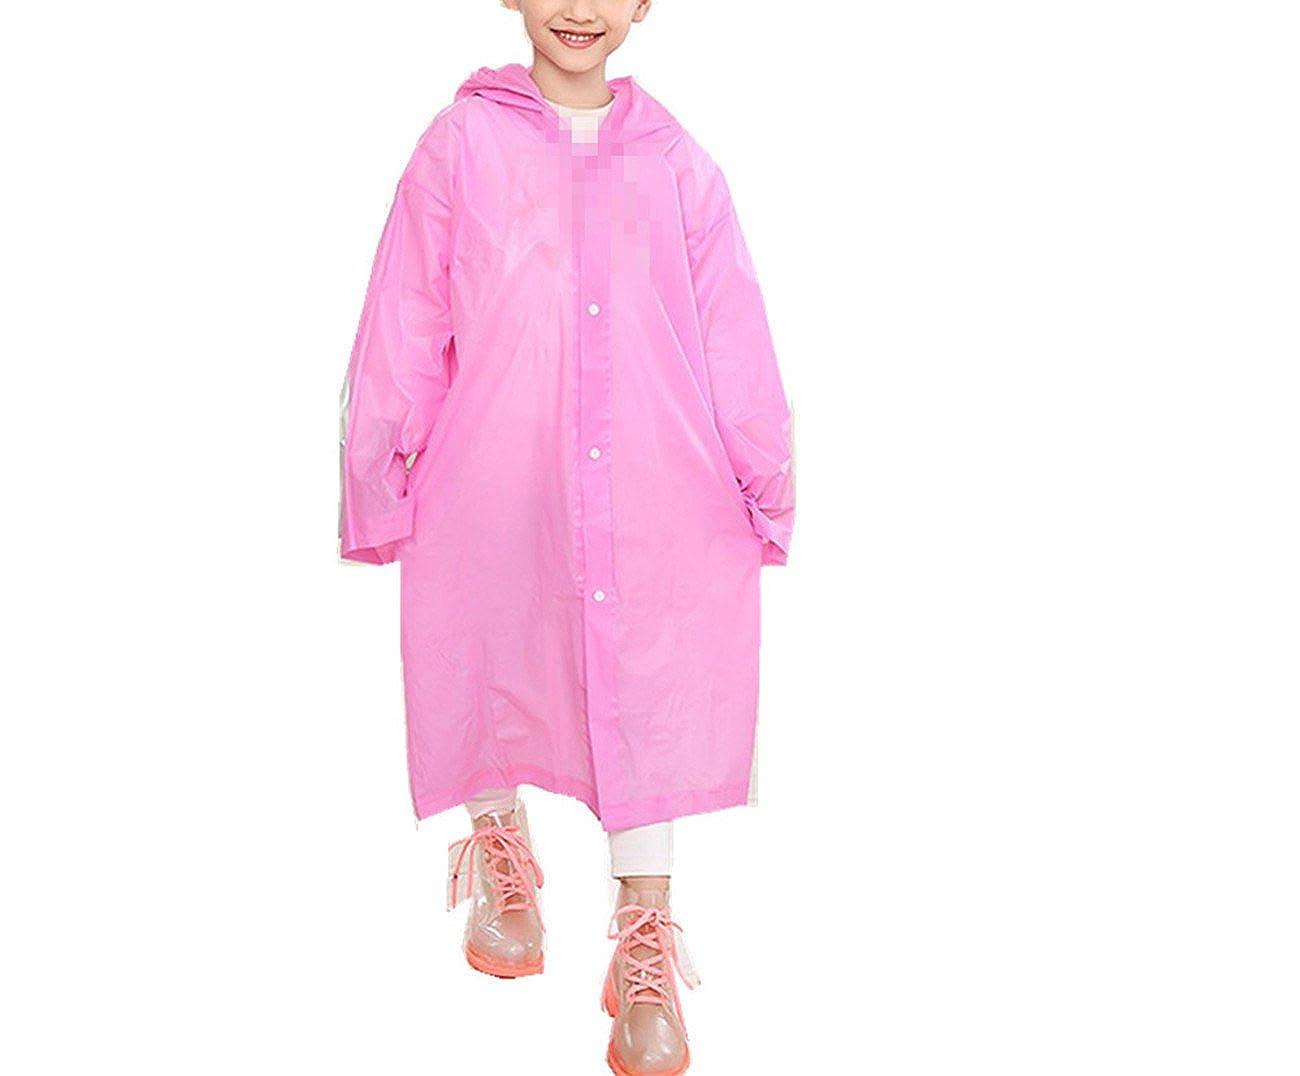 Yiluweinir Age 6~12 Kids Hooded Rain Jacket Raincoat Cover Long Rainwear